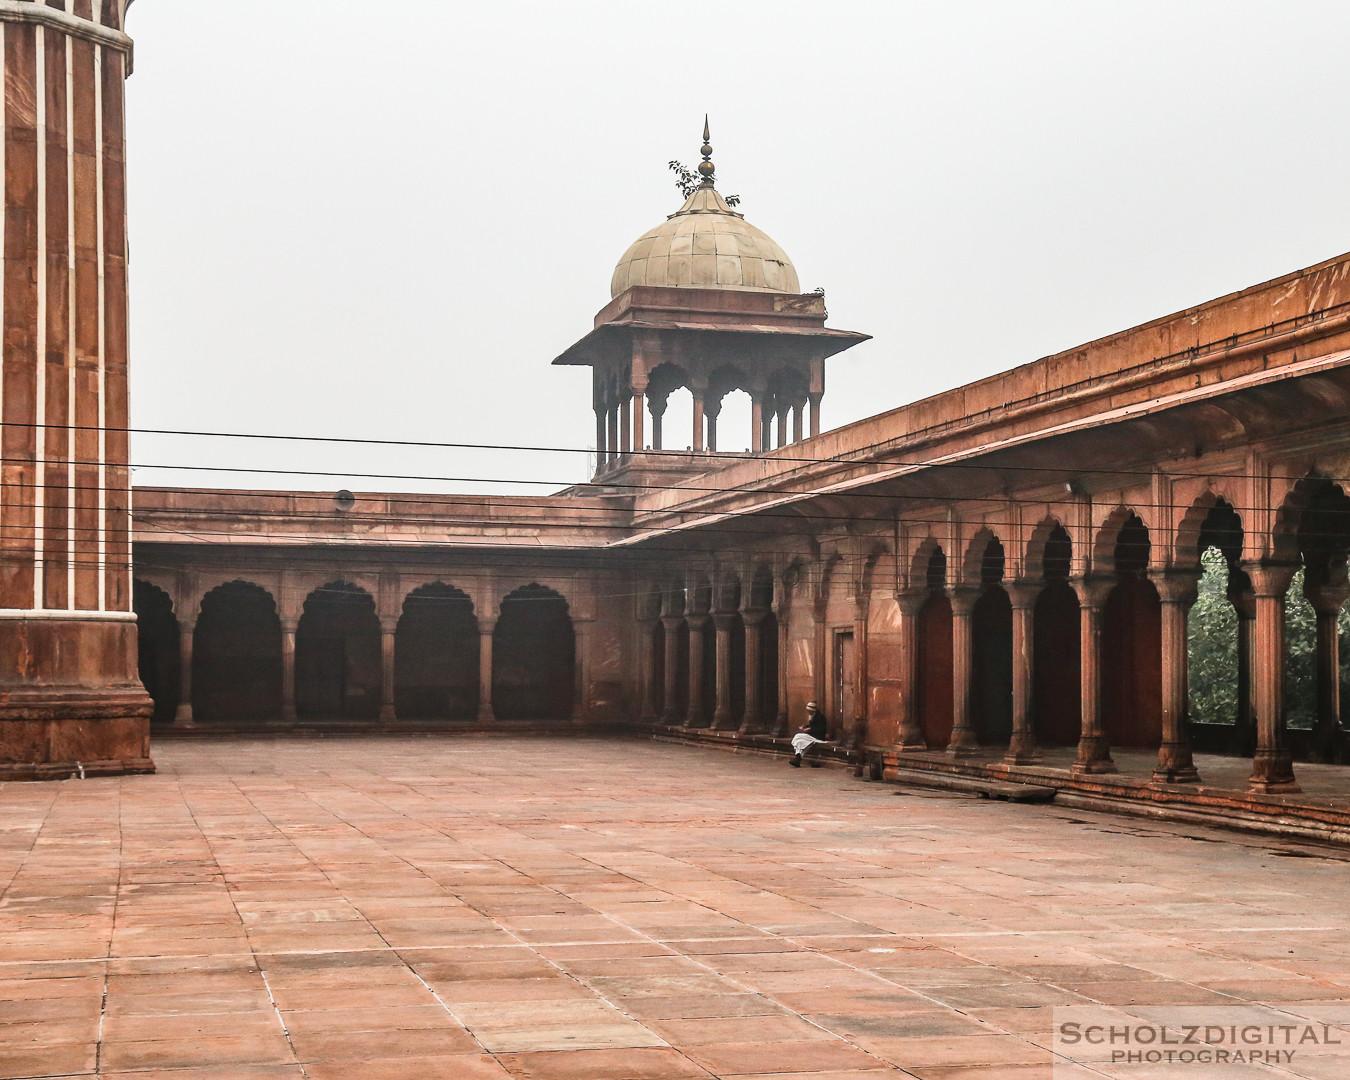 Asien, India, Indien, Jama Masjid in Delhi, Moschee, Shahjahanabad